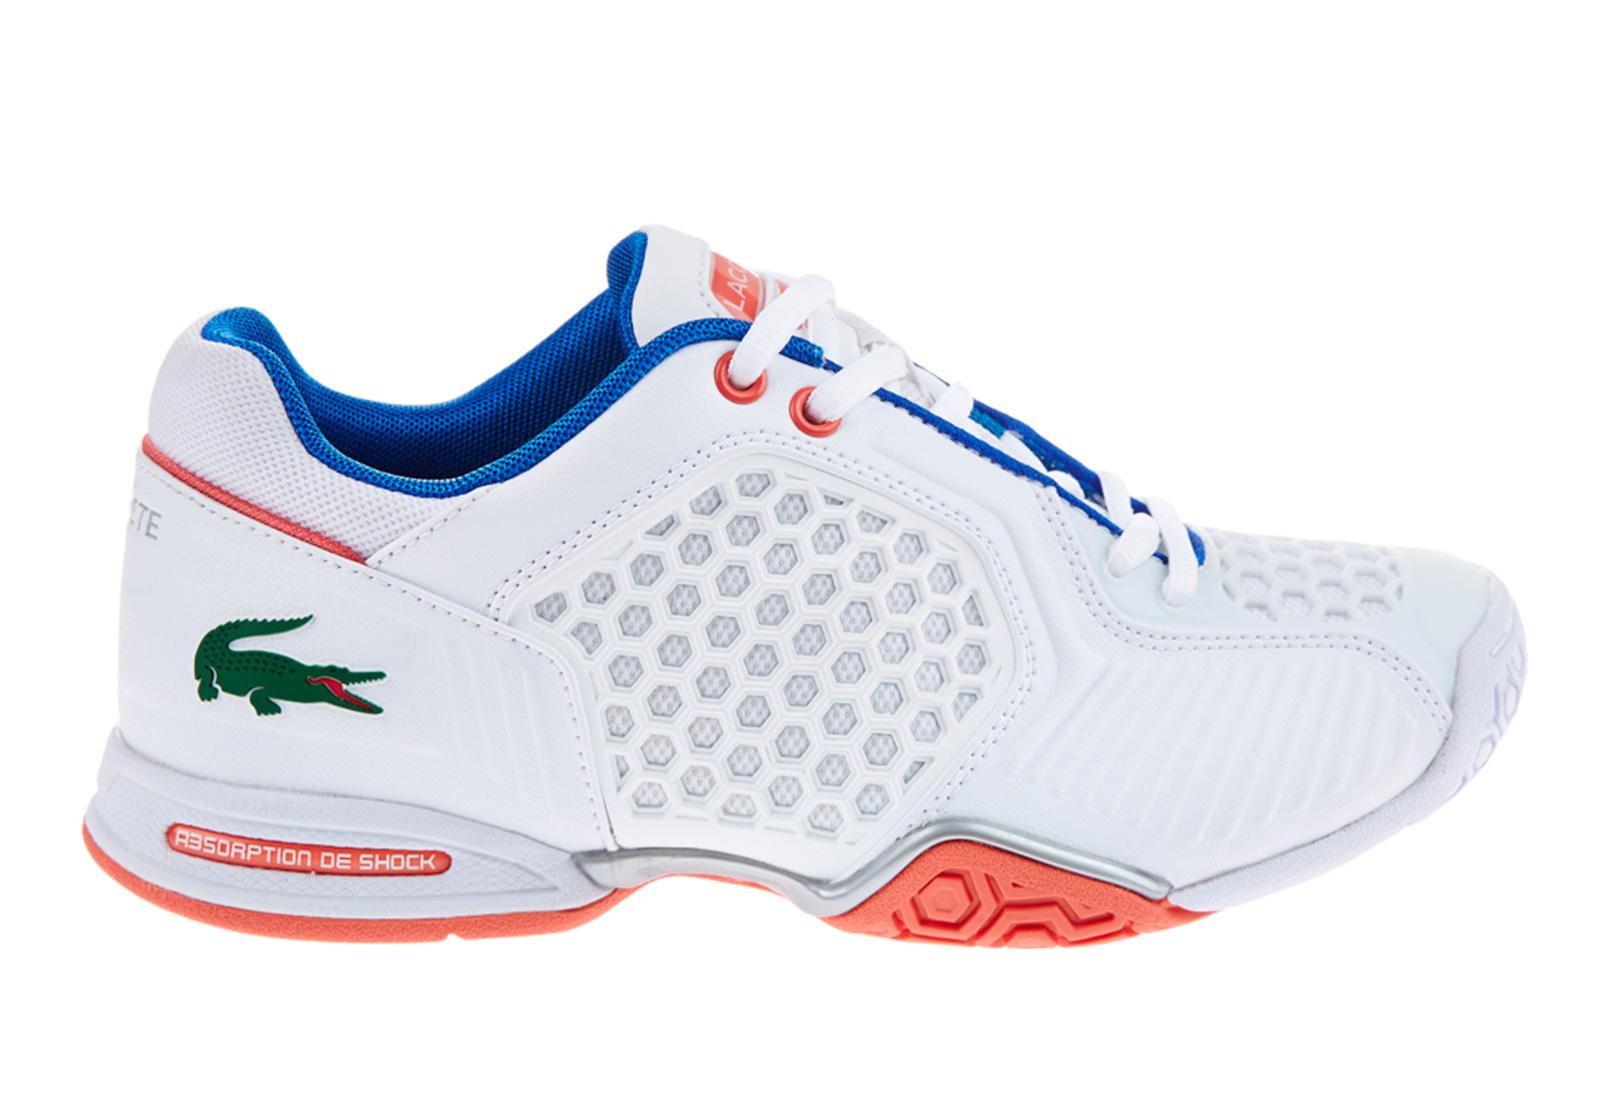 61088881da4 Lacoste Shoes - Repel 2 Res - zx-spw1052b53 - Online shop for ...